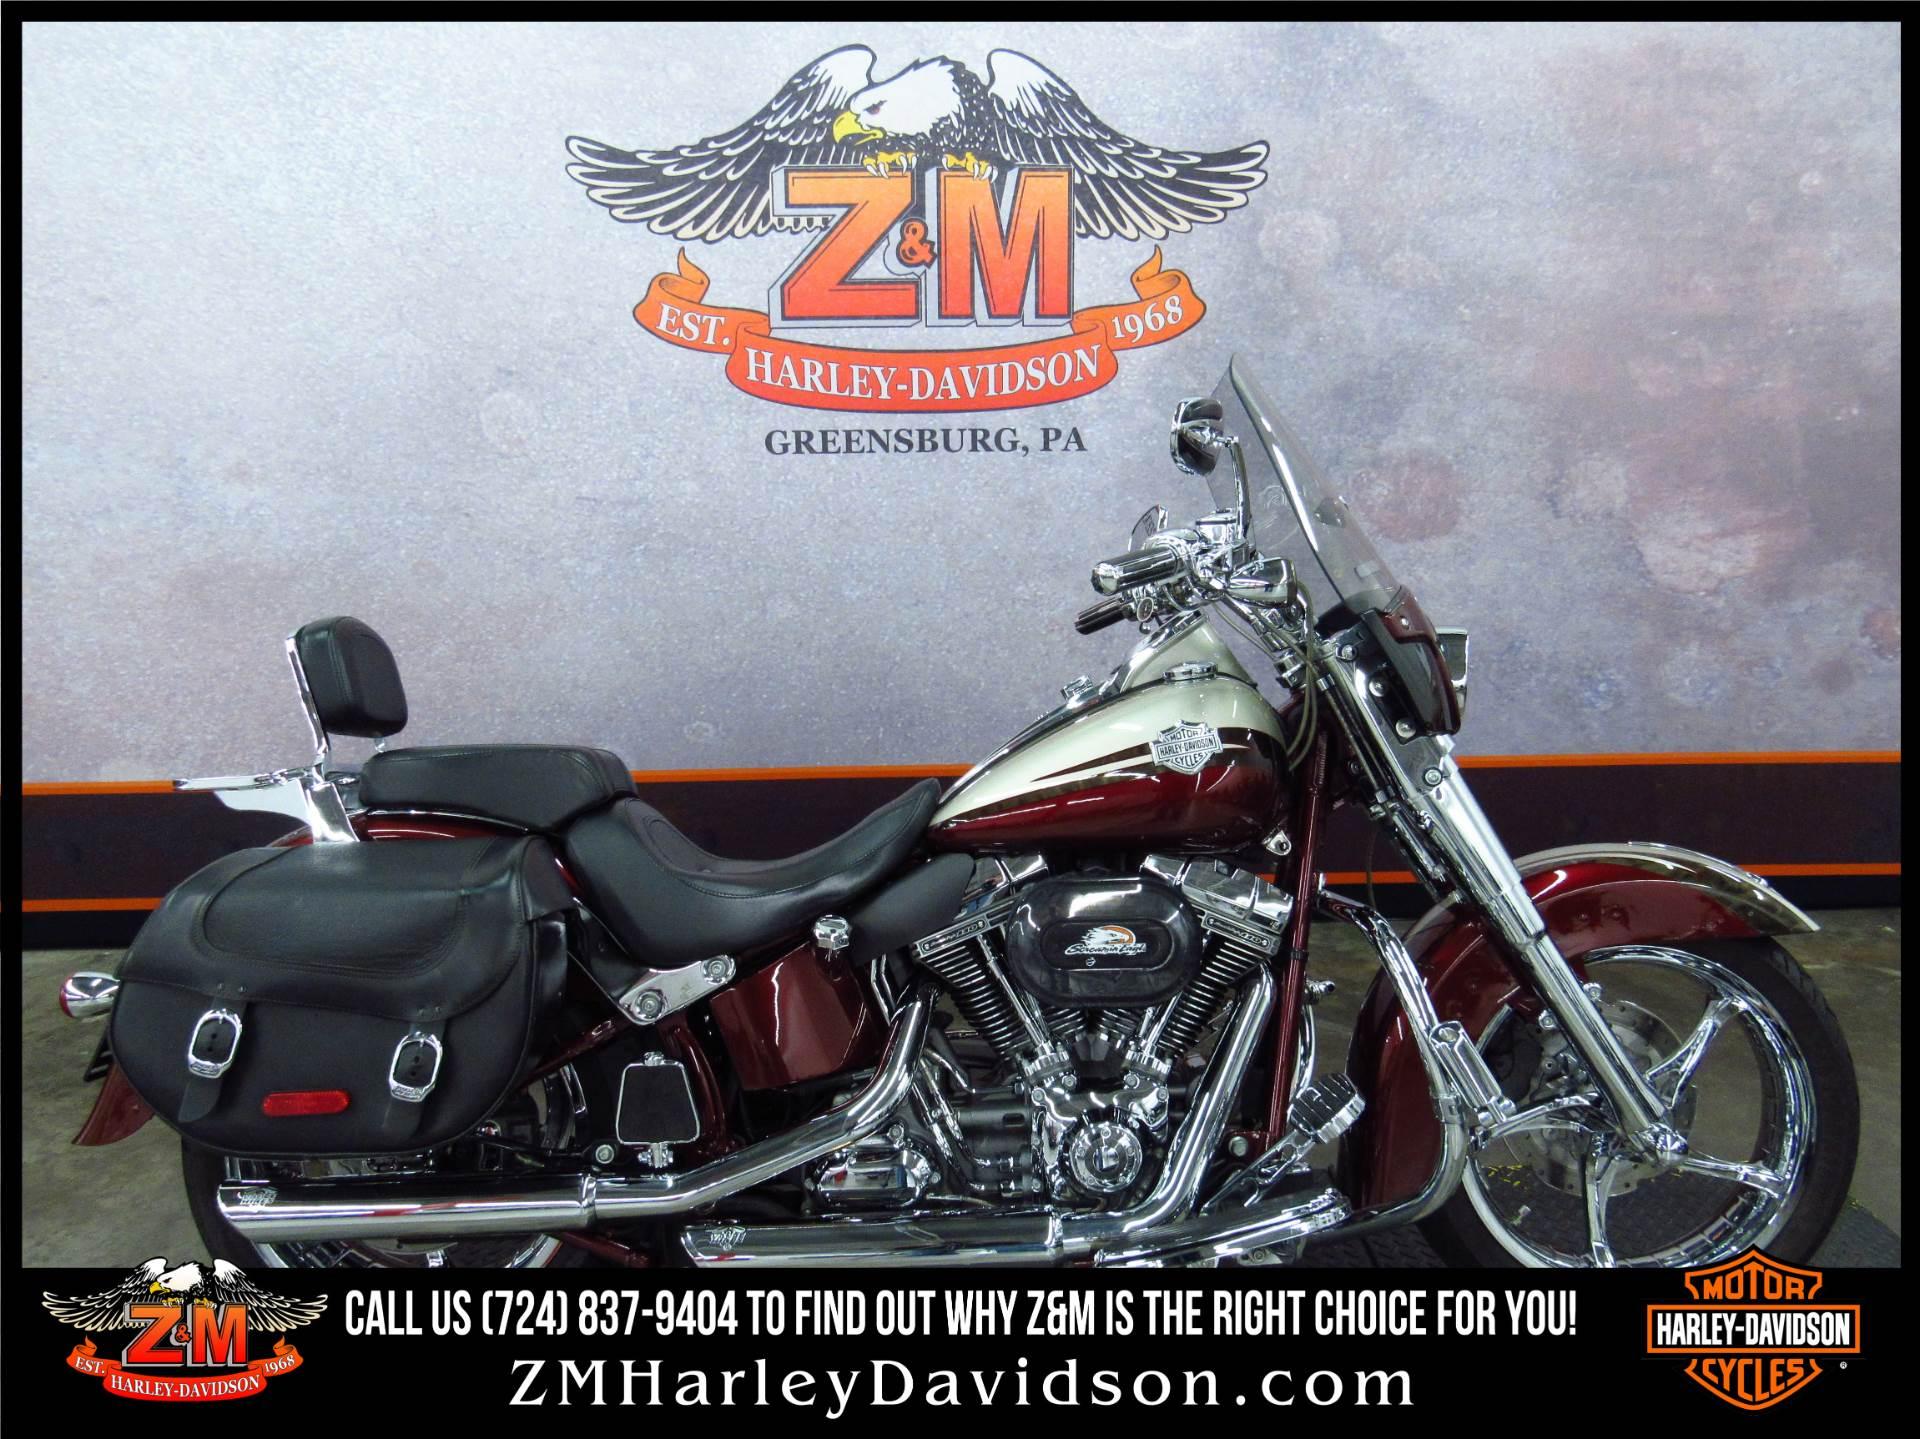 2010 Harley Davidson Cvo Softail Convertible In Greensburg Pennsylvania